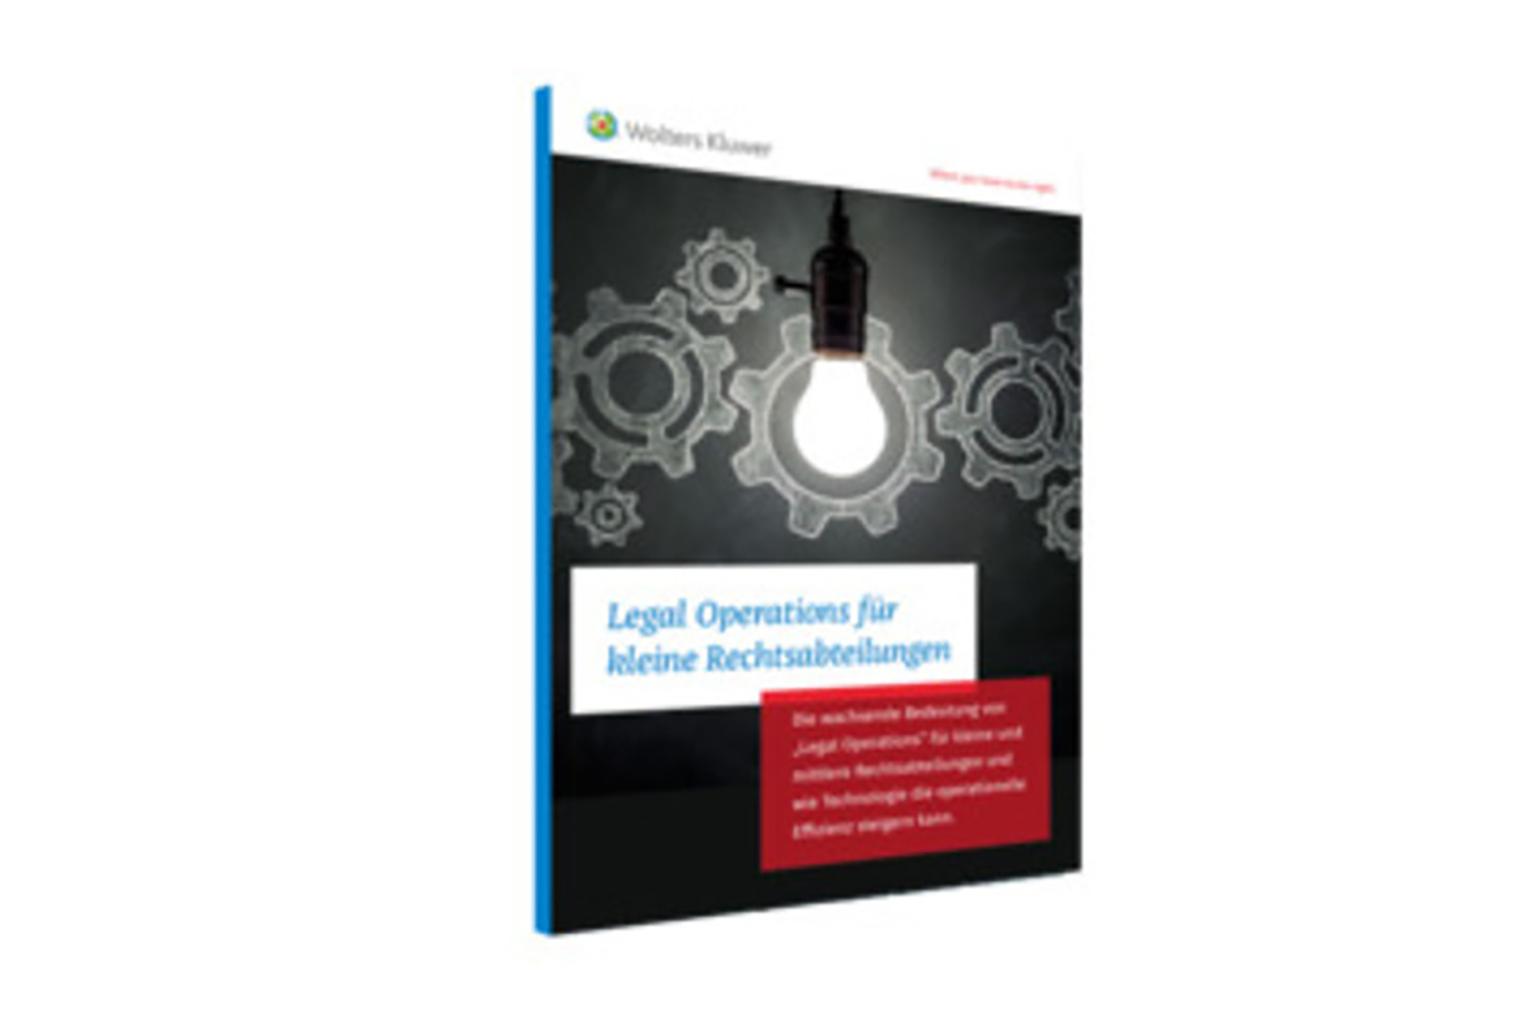 Legisway-Legal-Operation-Whitepaper-DE-1536x1024